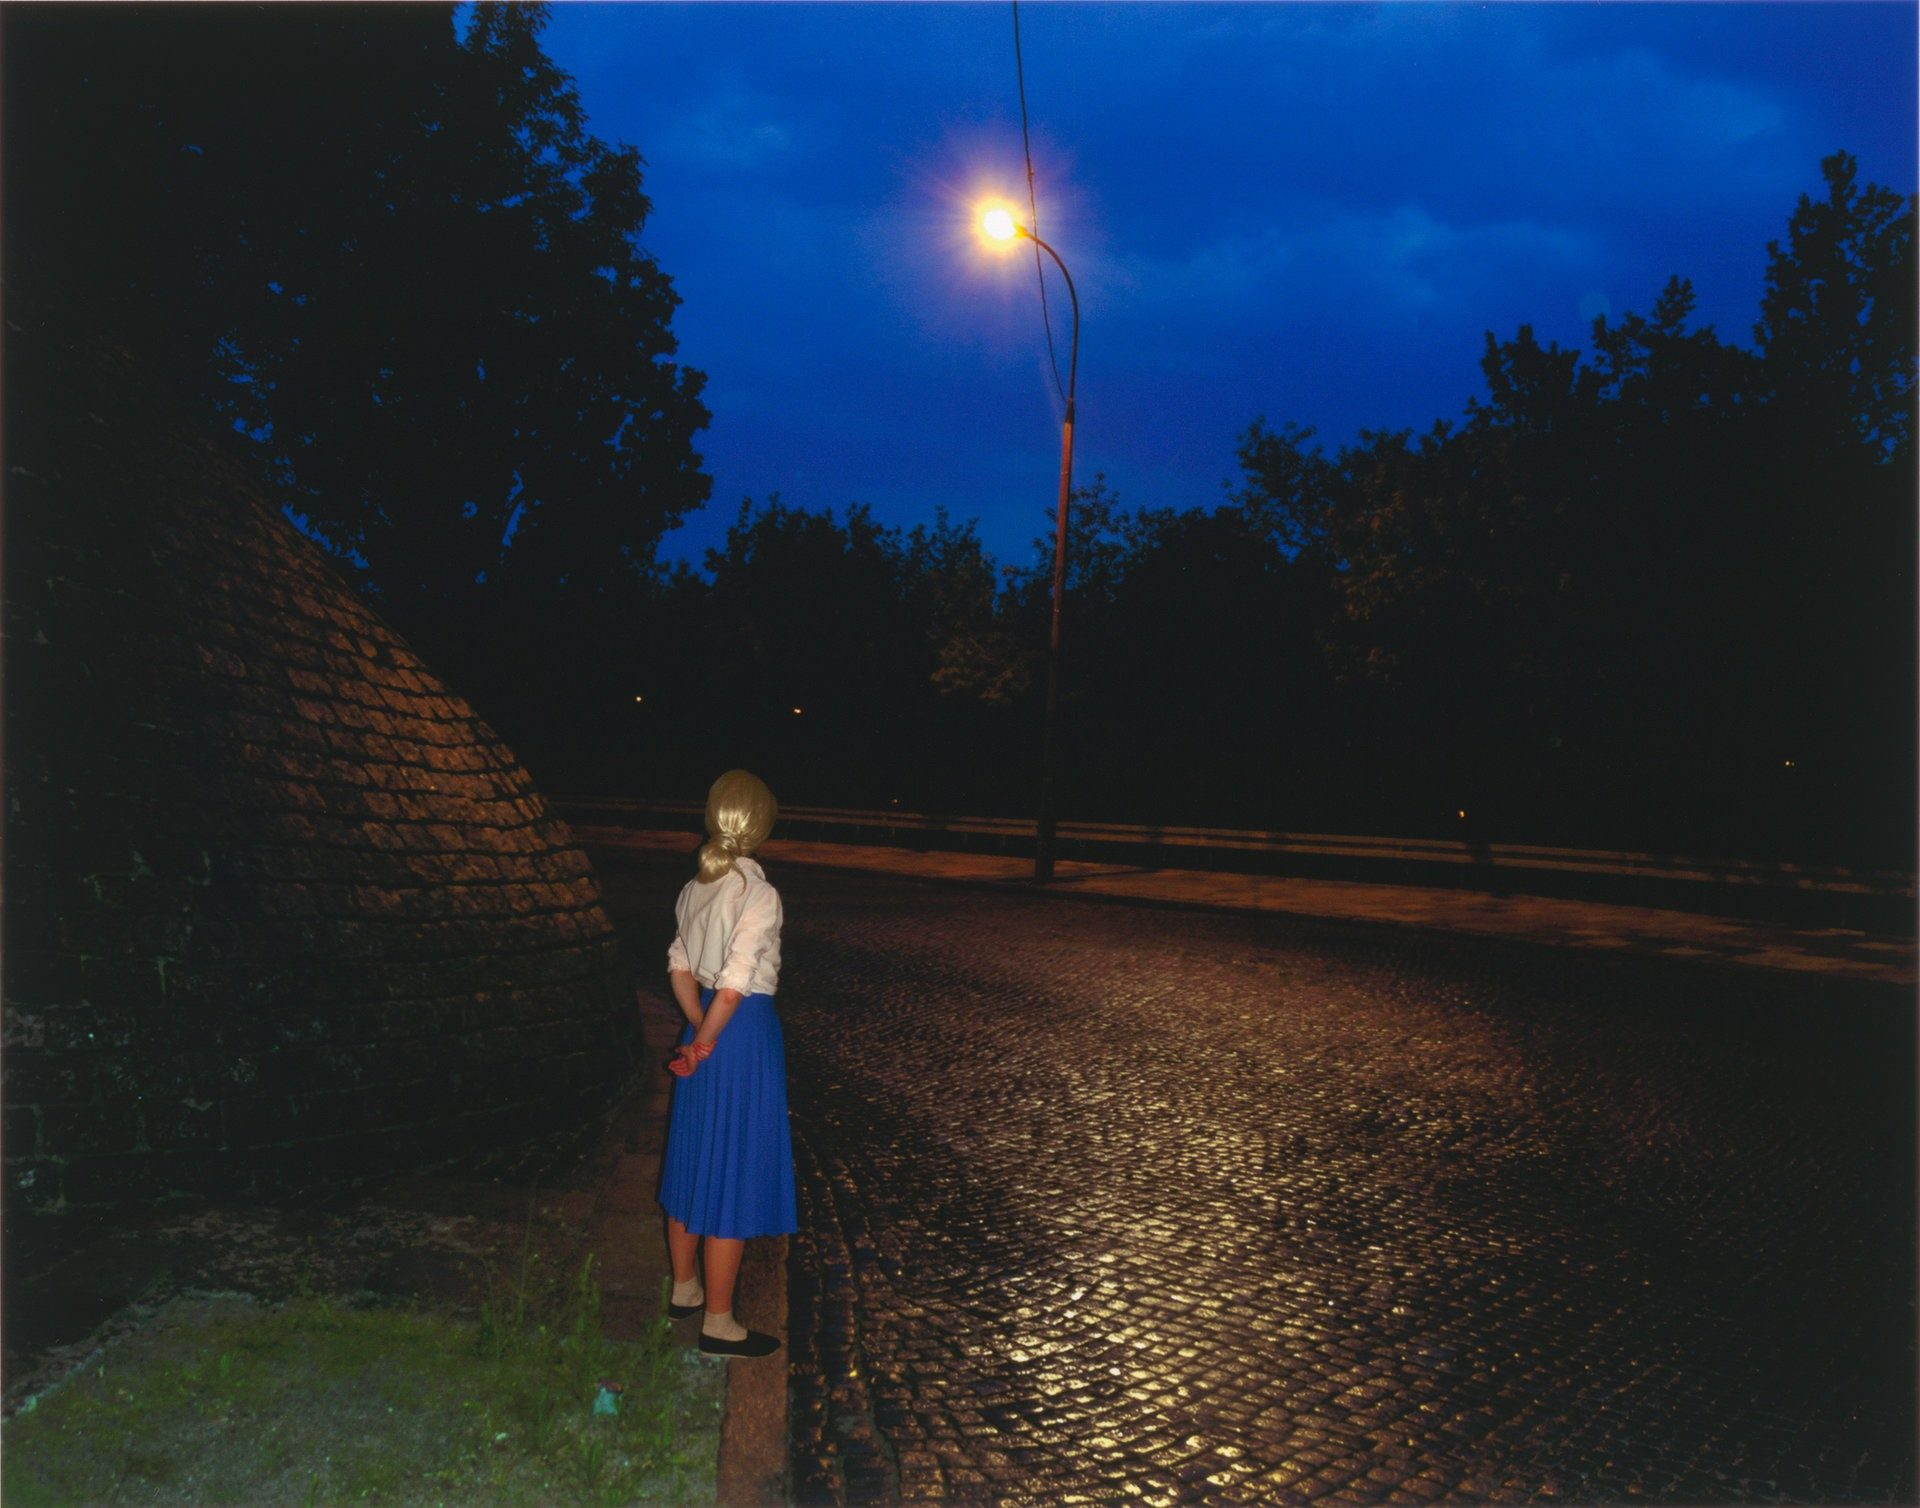 Aneta Grzeszykowska, Untitled Film Stills #48, 2006